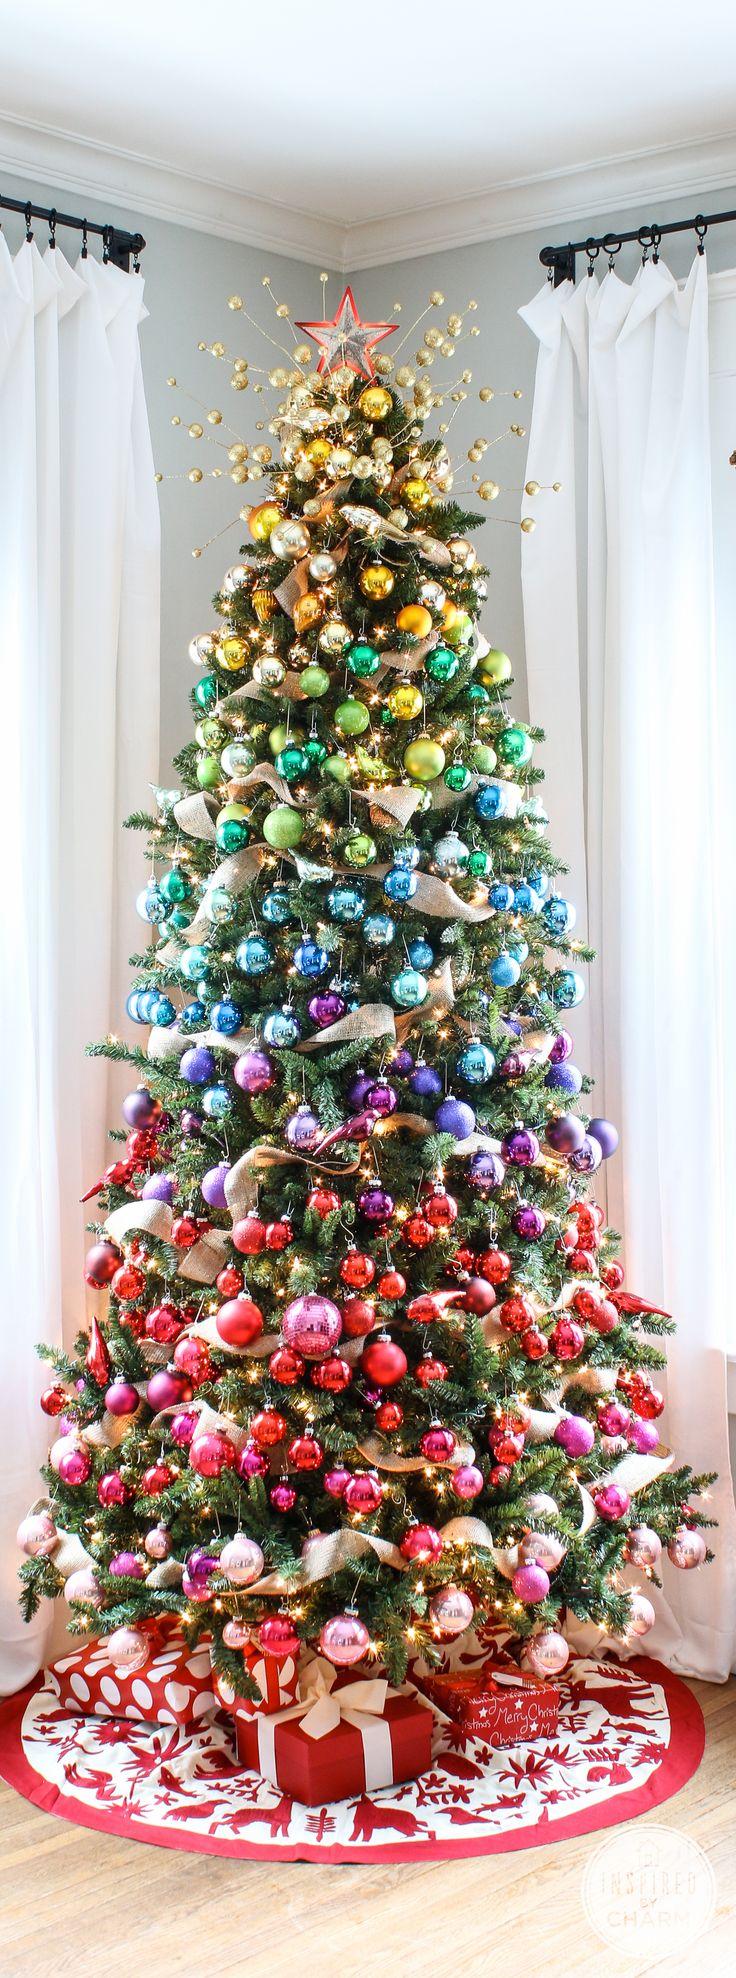 decorar-arbol-navidad-7